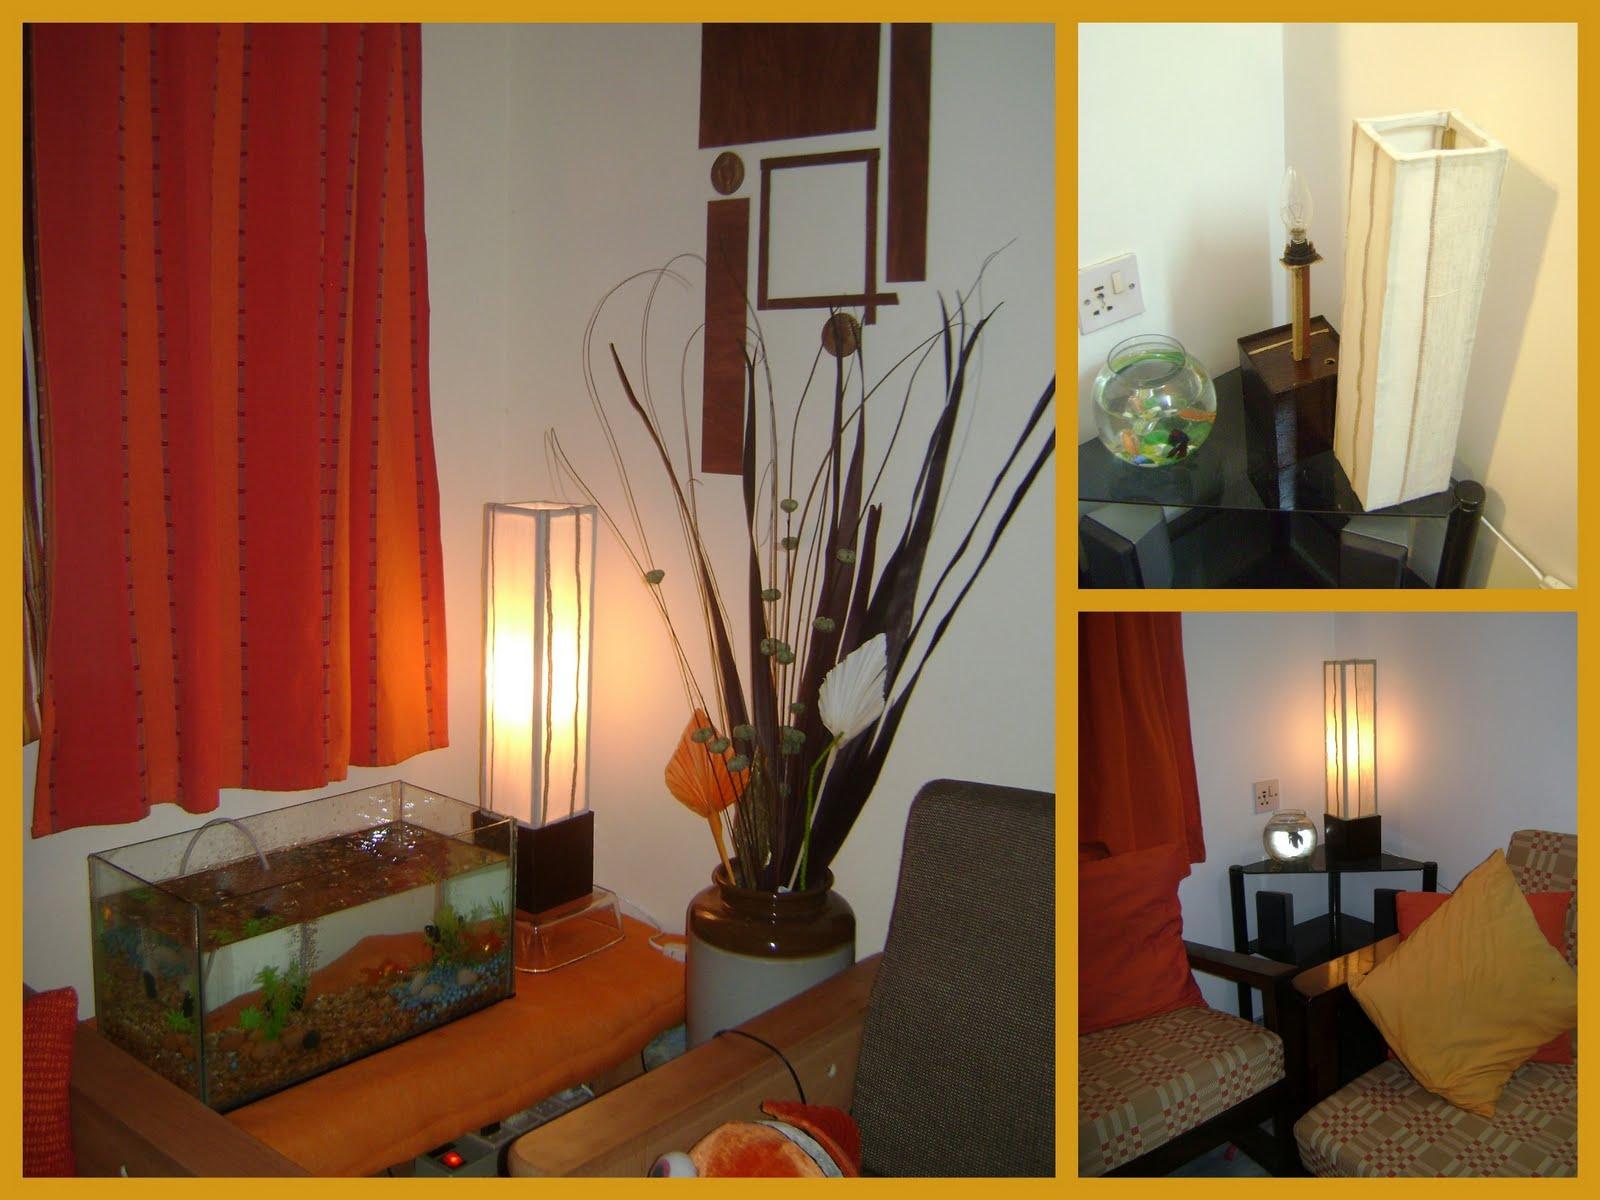 Lamp shade indian woodworkingdiyartscrafts blog table lamp or bedside lamp using jute aloadofball Image collections